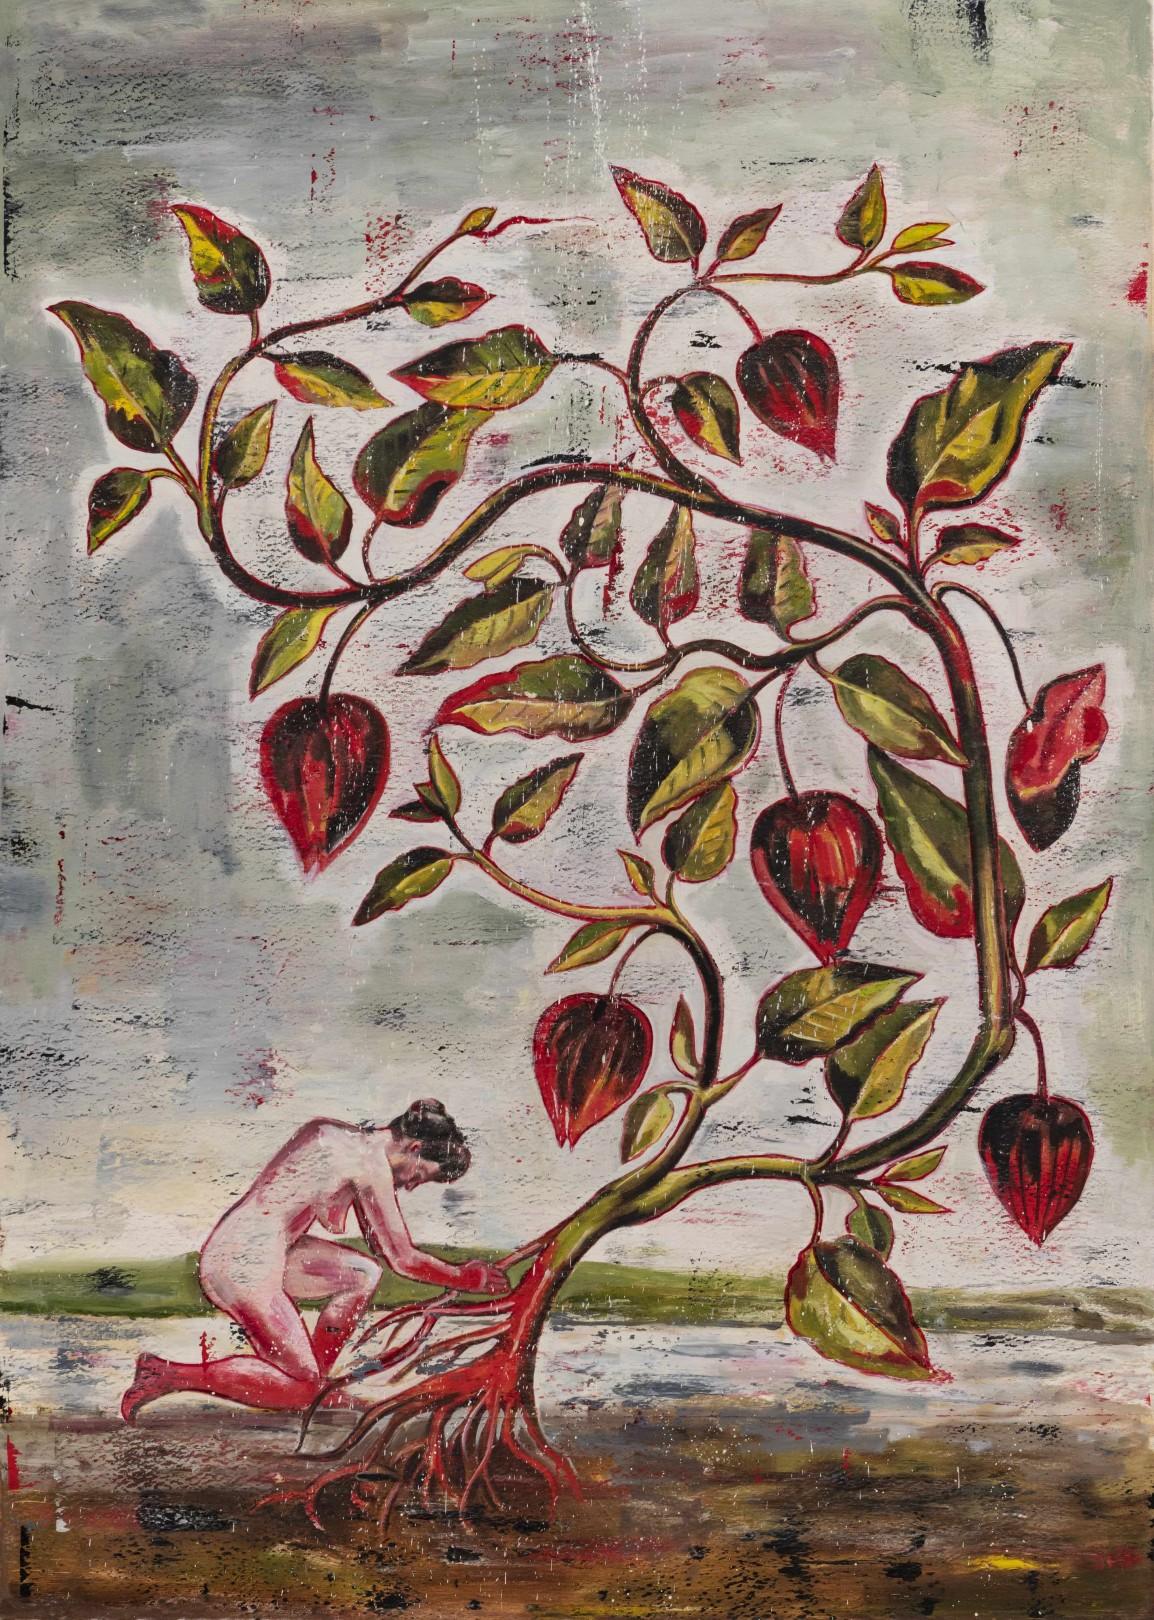 Nicky Nodjoumi Environmental Series - Physalis Alkekengi, 2019 0il on canvas 178 x 127 cm. / 70 x 50 in.